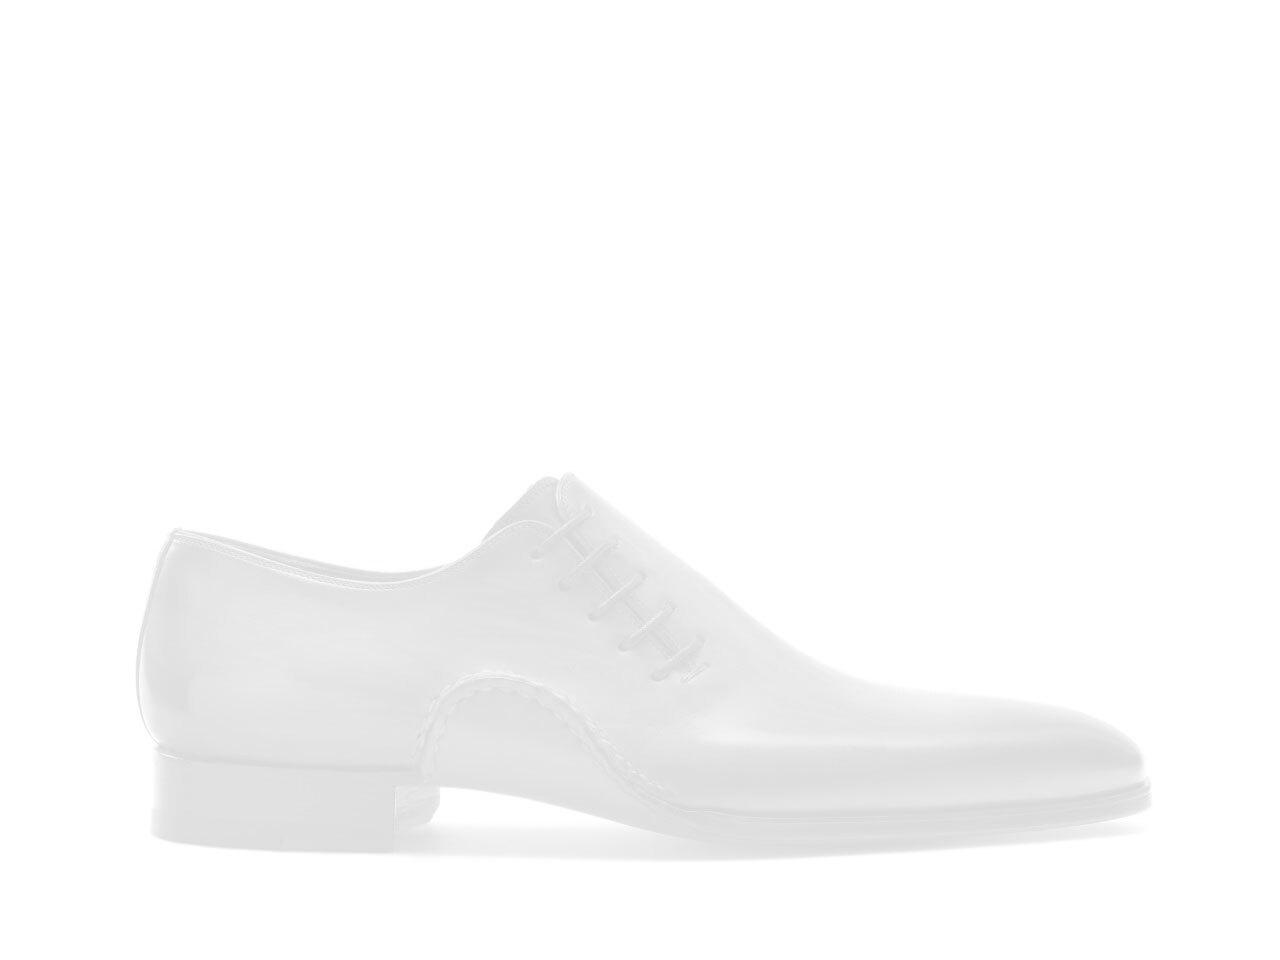 Sole of the Magnanni Dorio Black Men's Velvet Loafers